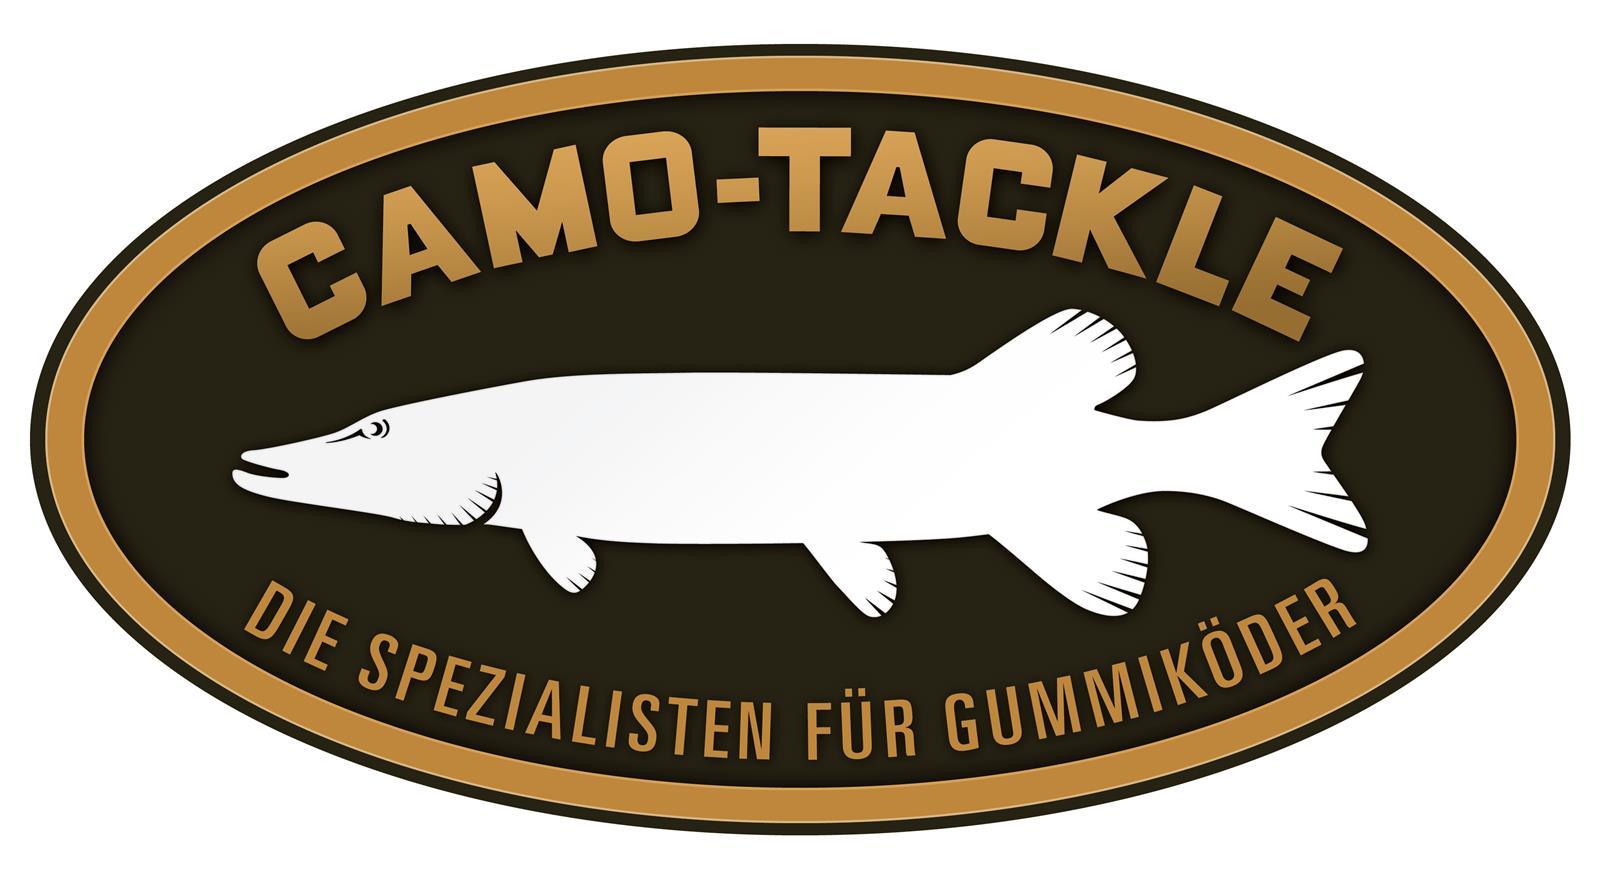 Camo Tackle